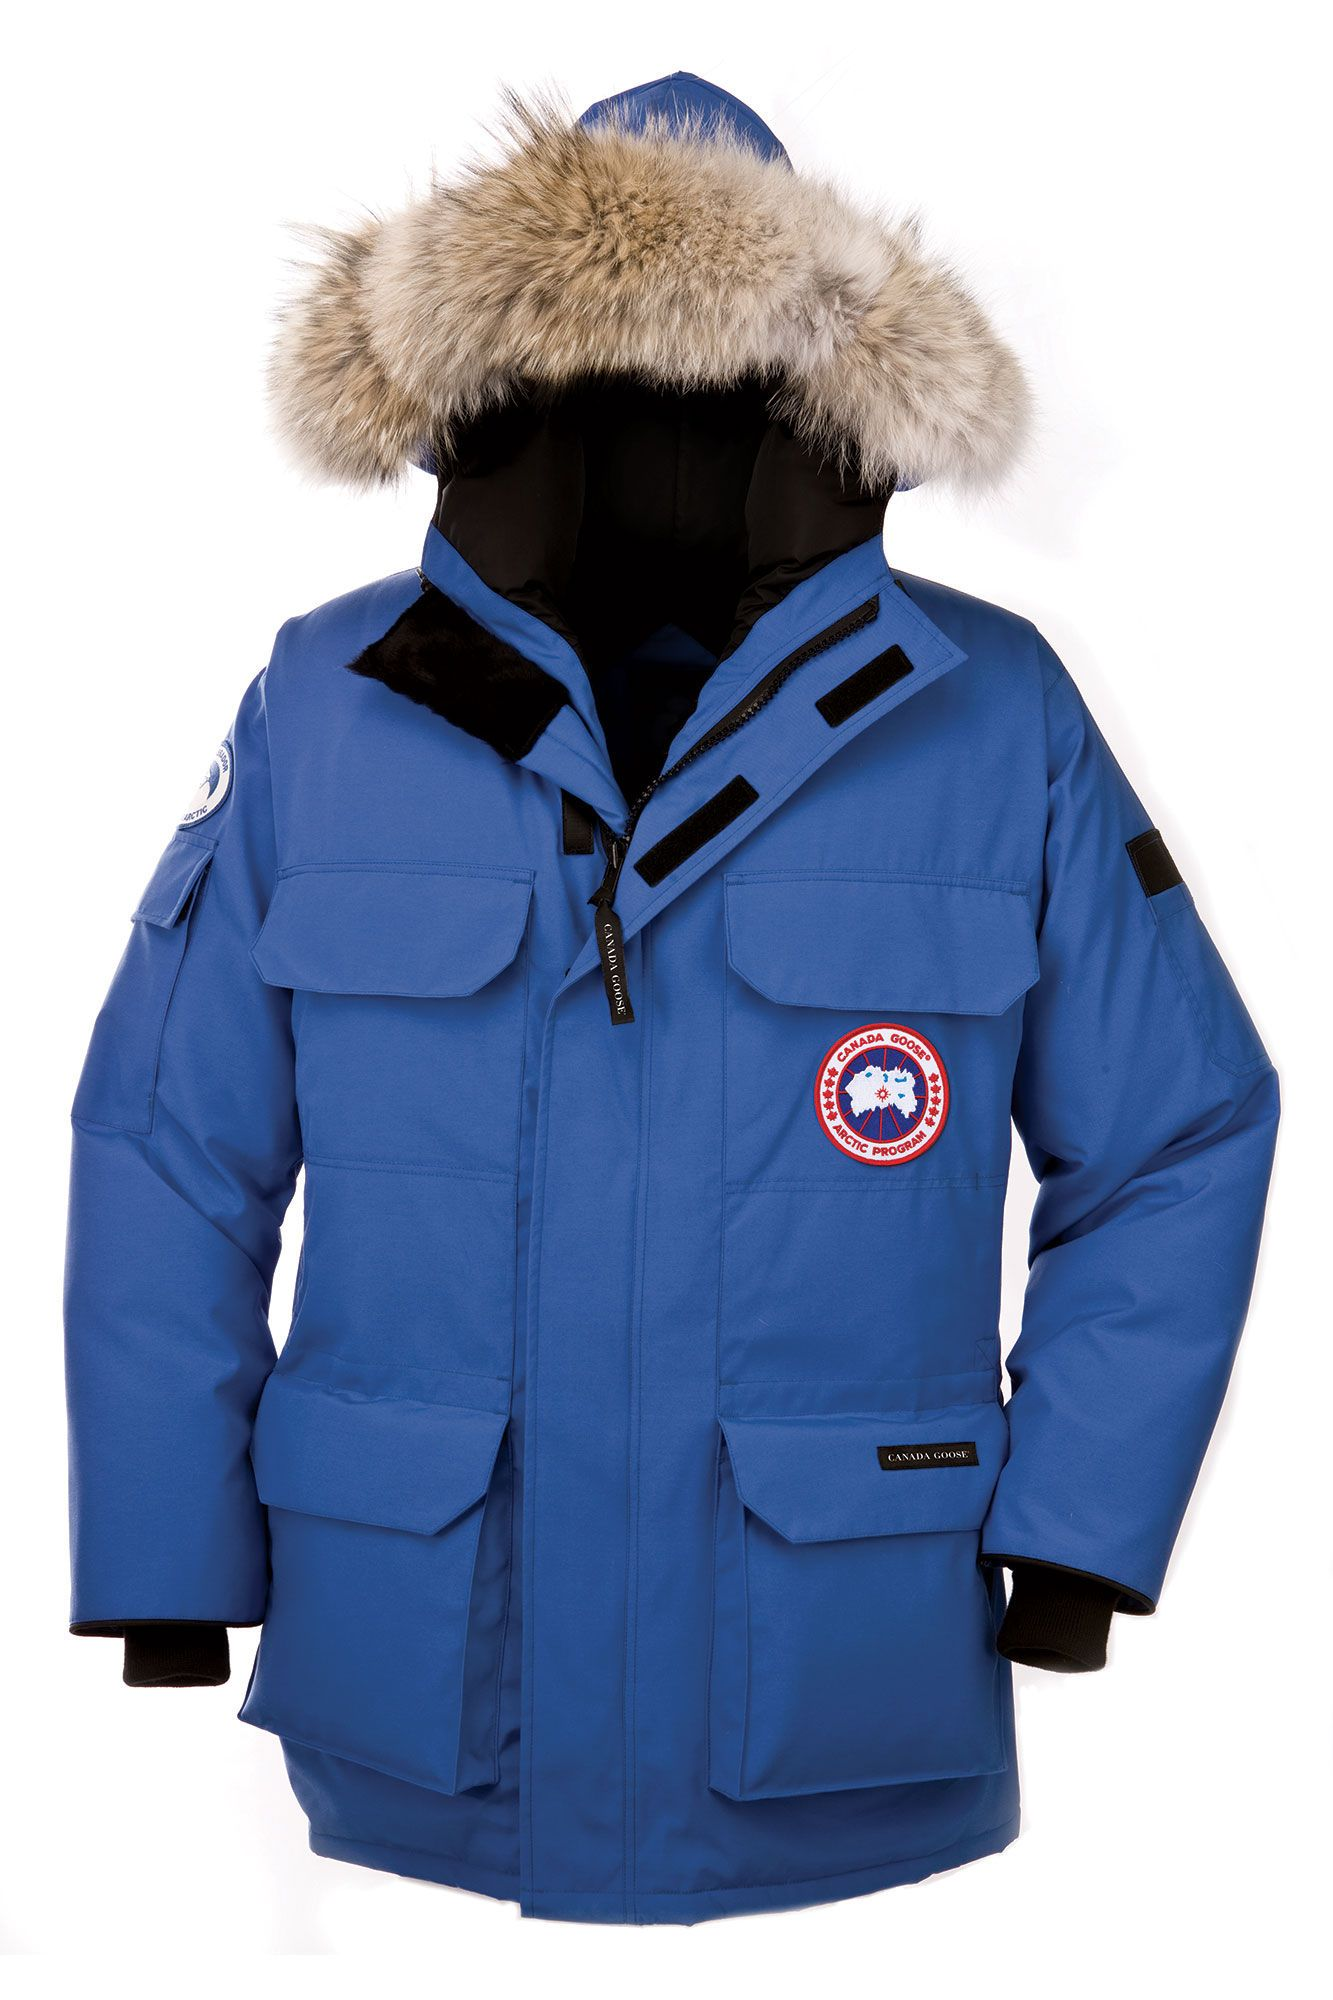 1869e4cabd8 Mens Polar Bears International PBI Expedition Parka